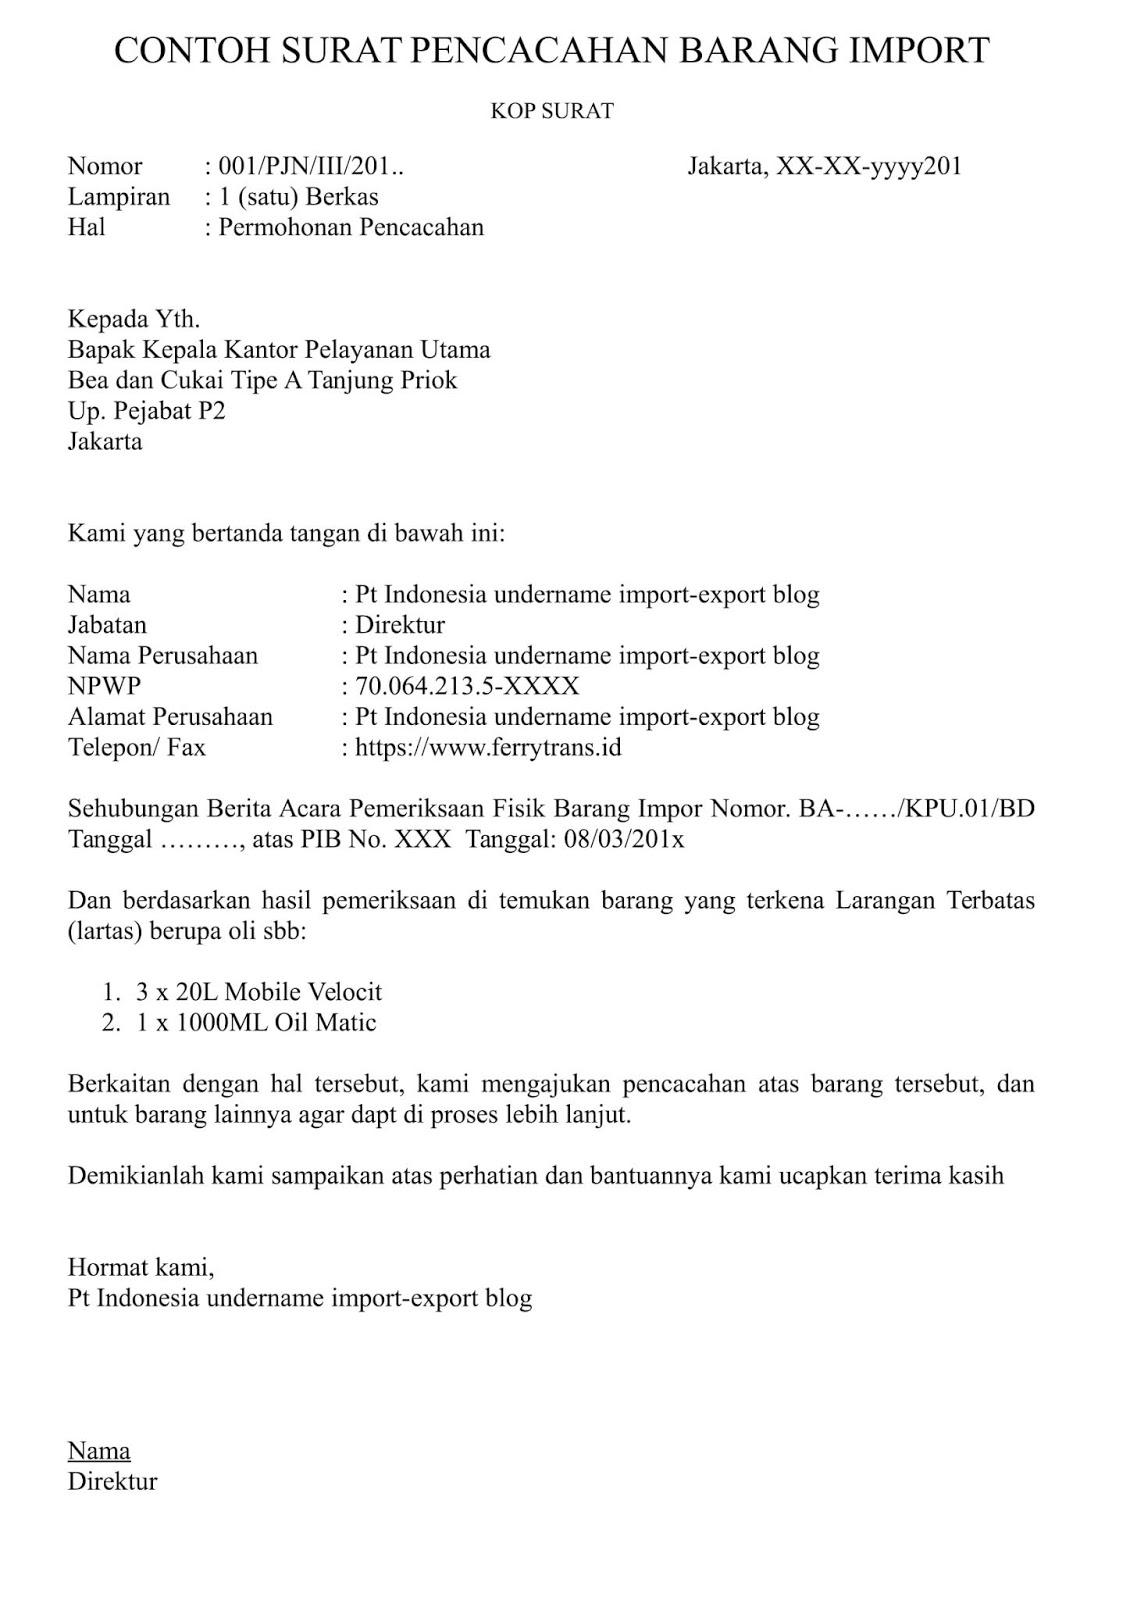 Contoh Surat Permohonan Pembukaan Pos Bc 1 1 Sementara Indonesia Undername Import Export Blog